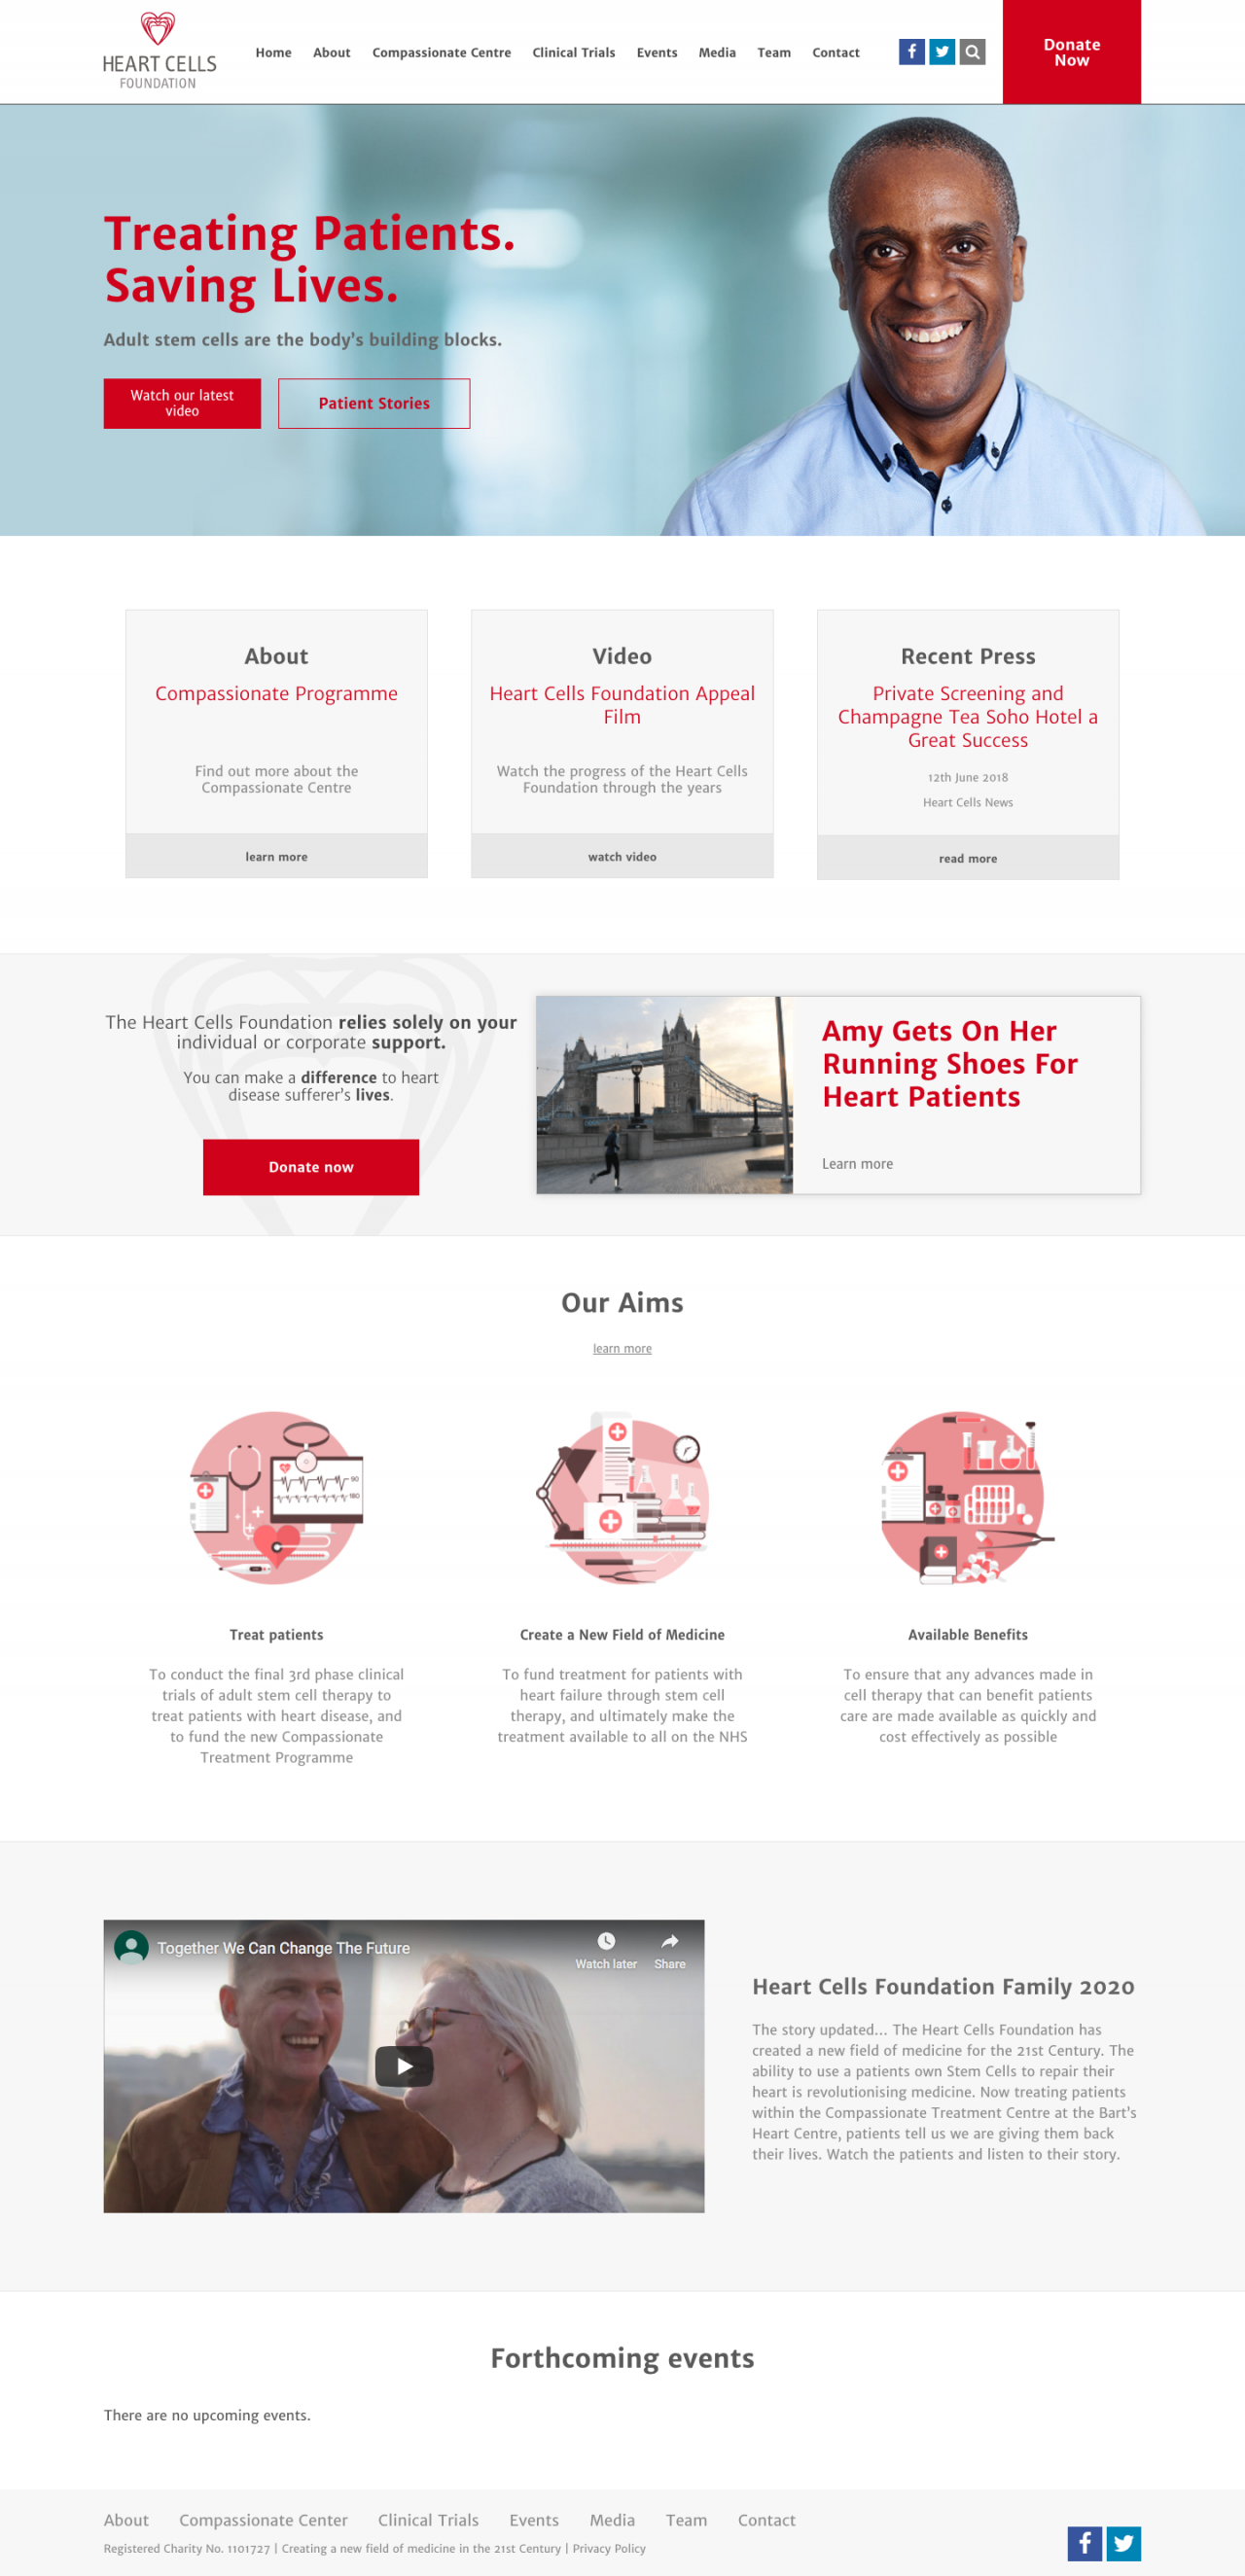 HeartCells Foundation Website | Tom Hoadley | Freelance Wordpress Developer